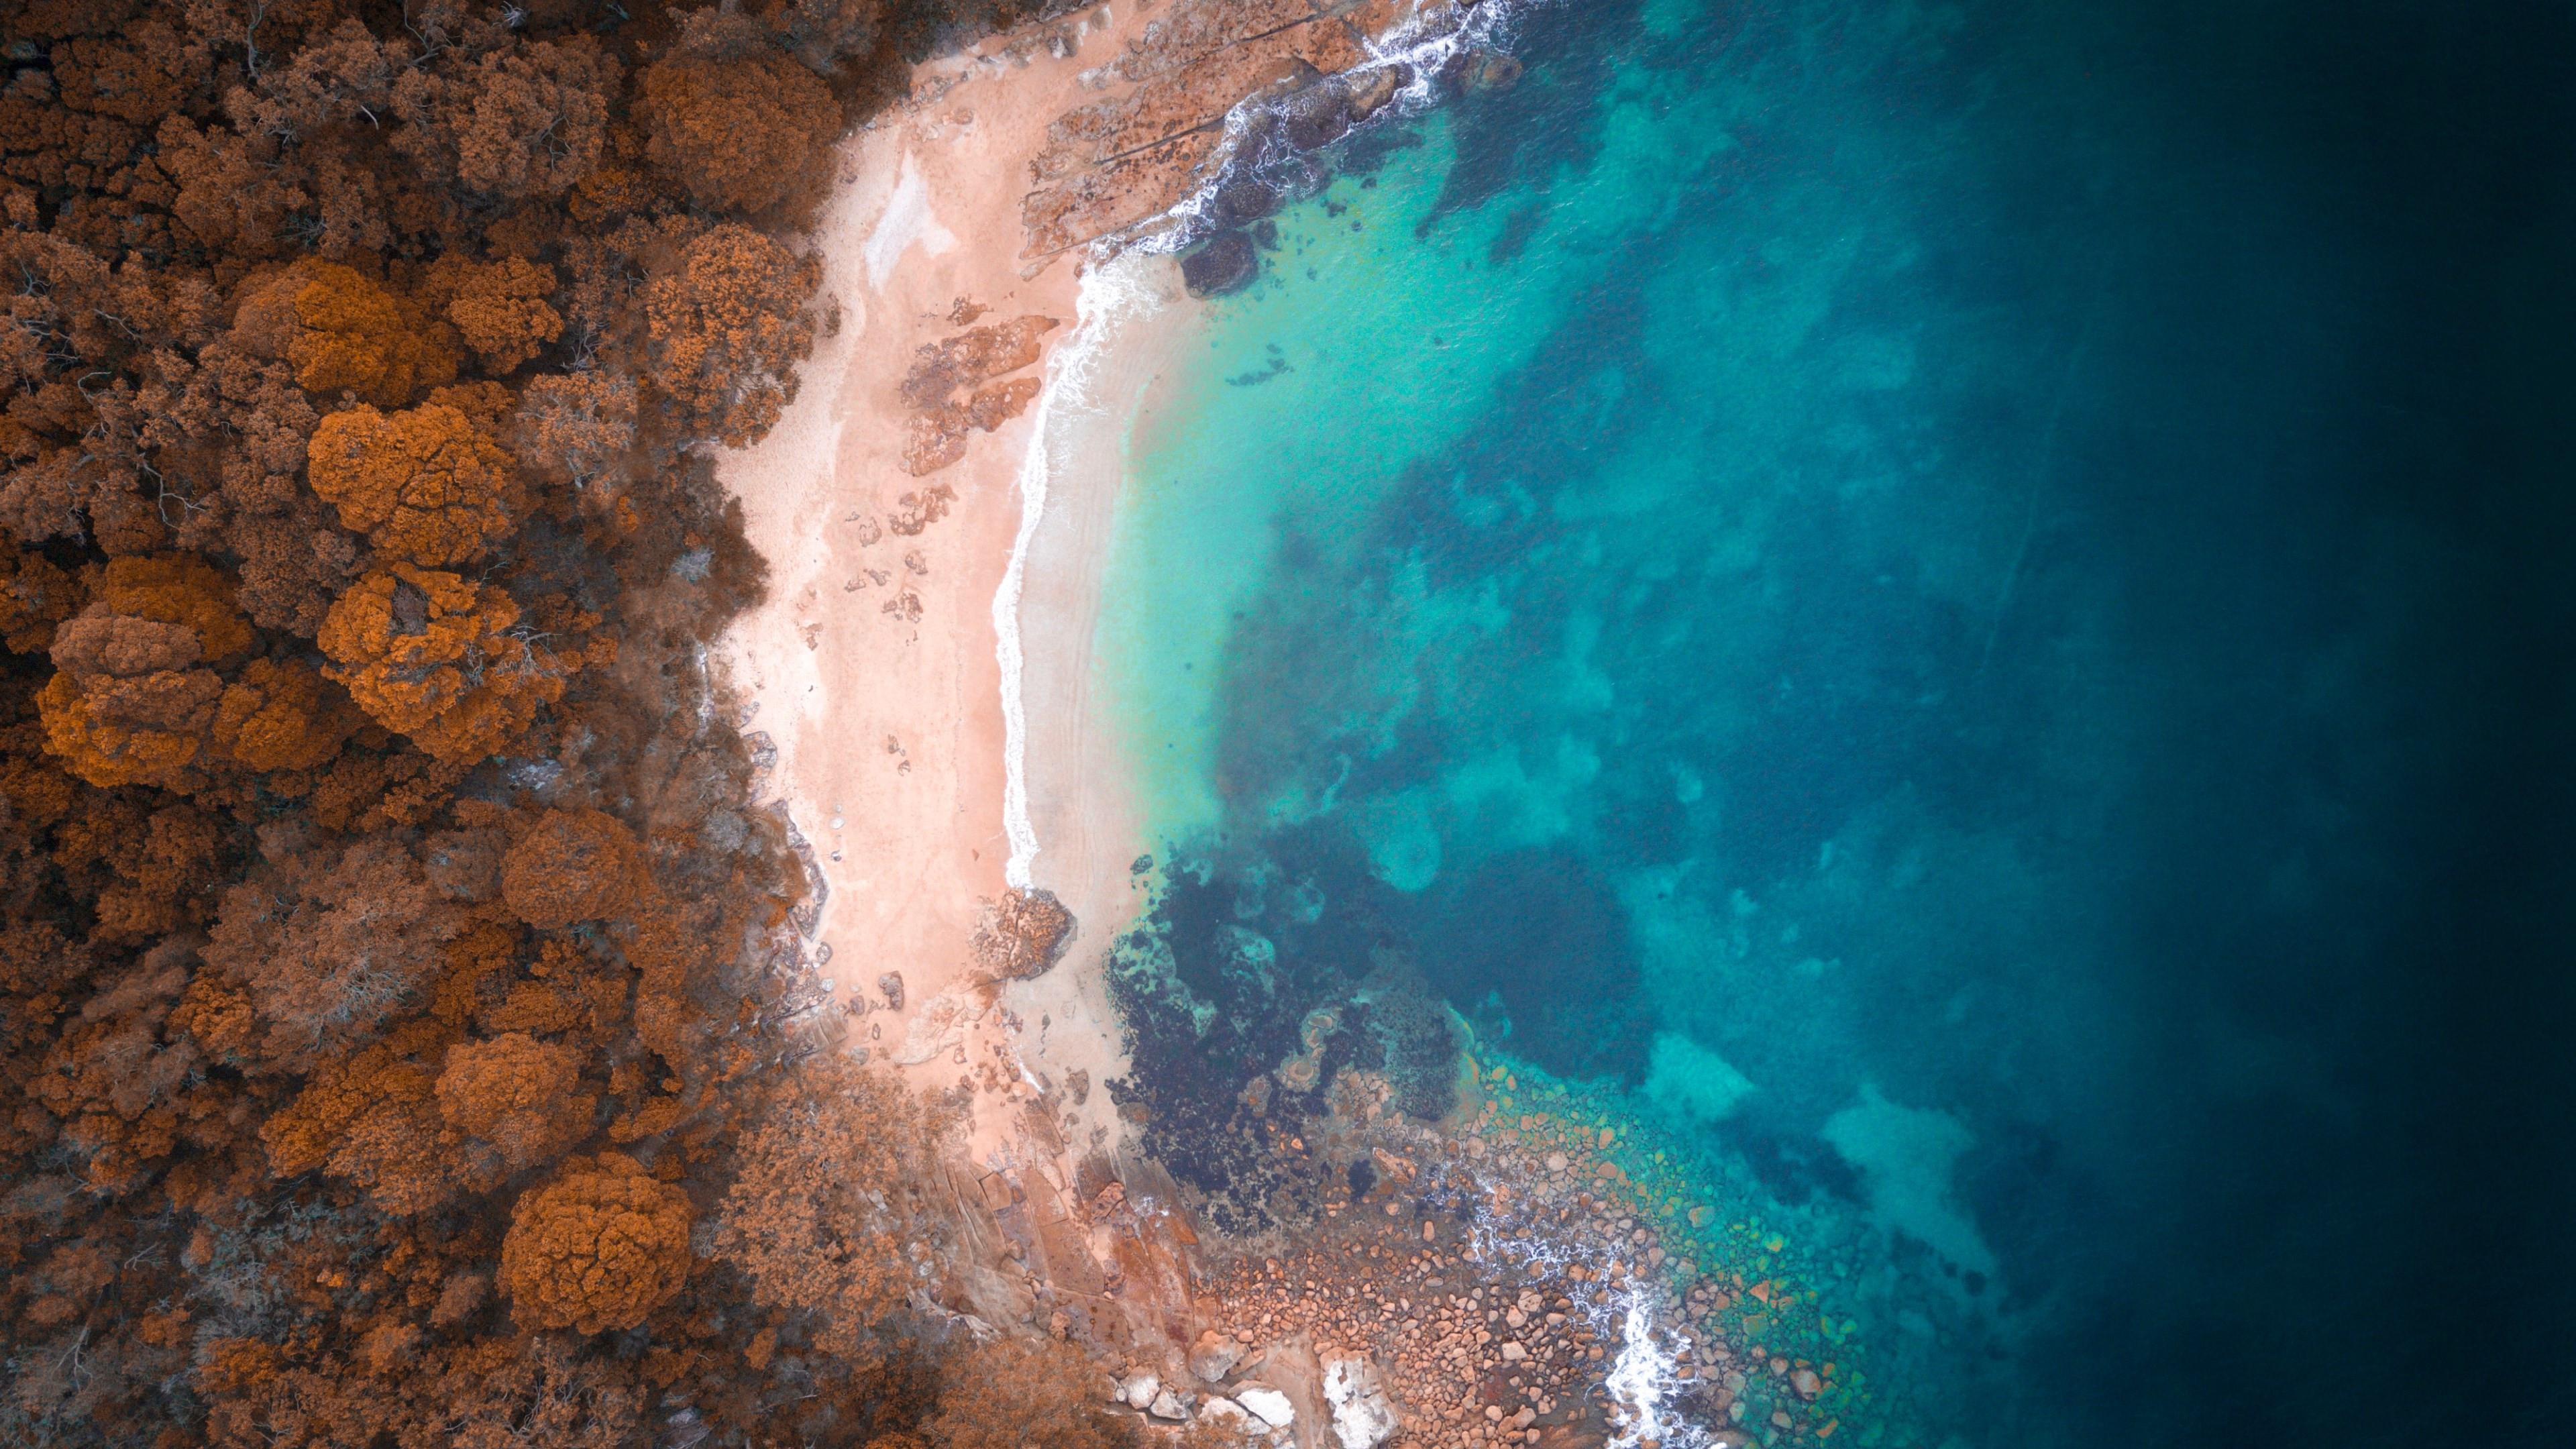 Beach Wallpaper Hd Download Wallpaper Reef Beach Australia 3840x2160